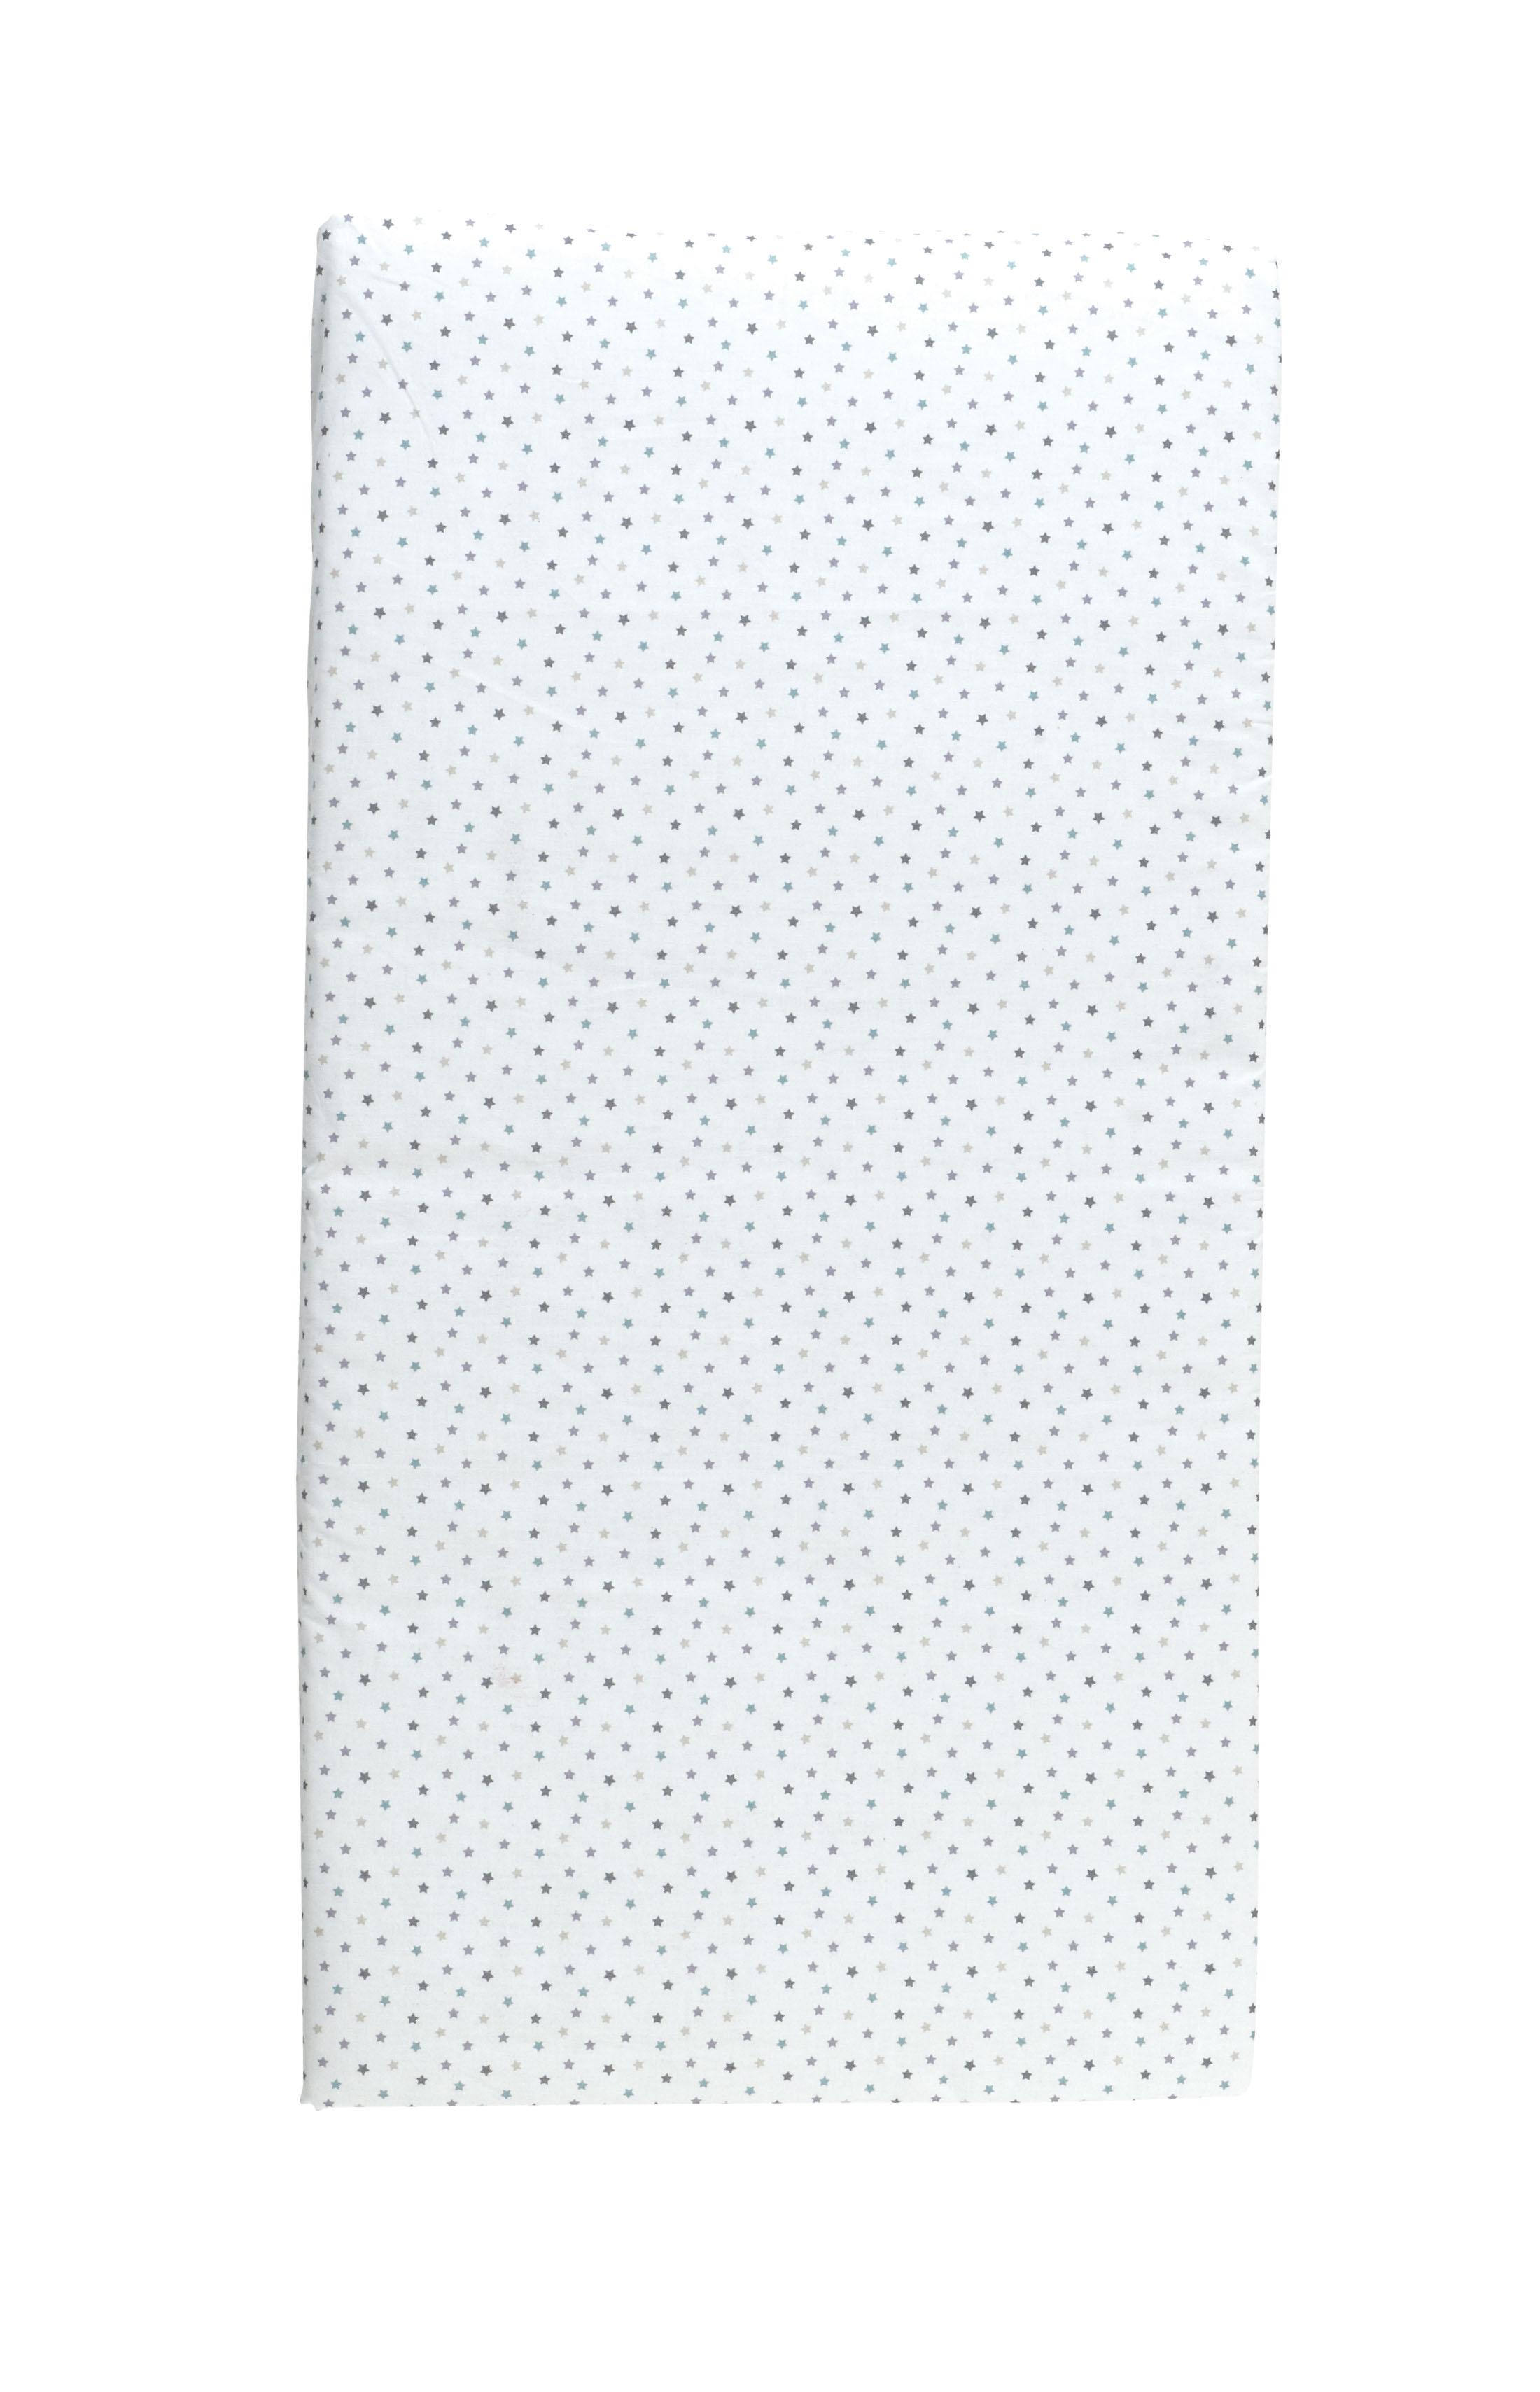 matelas de voyage toiles with matelas origami. Black Bedroom Furniture Sets. Home Design Ideas